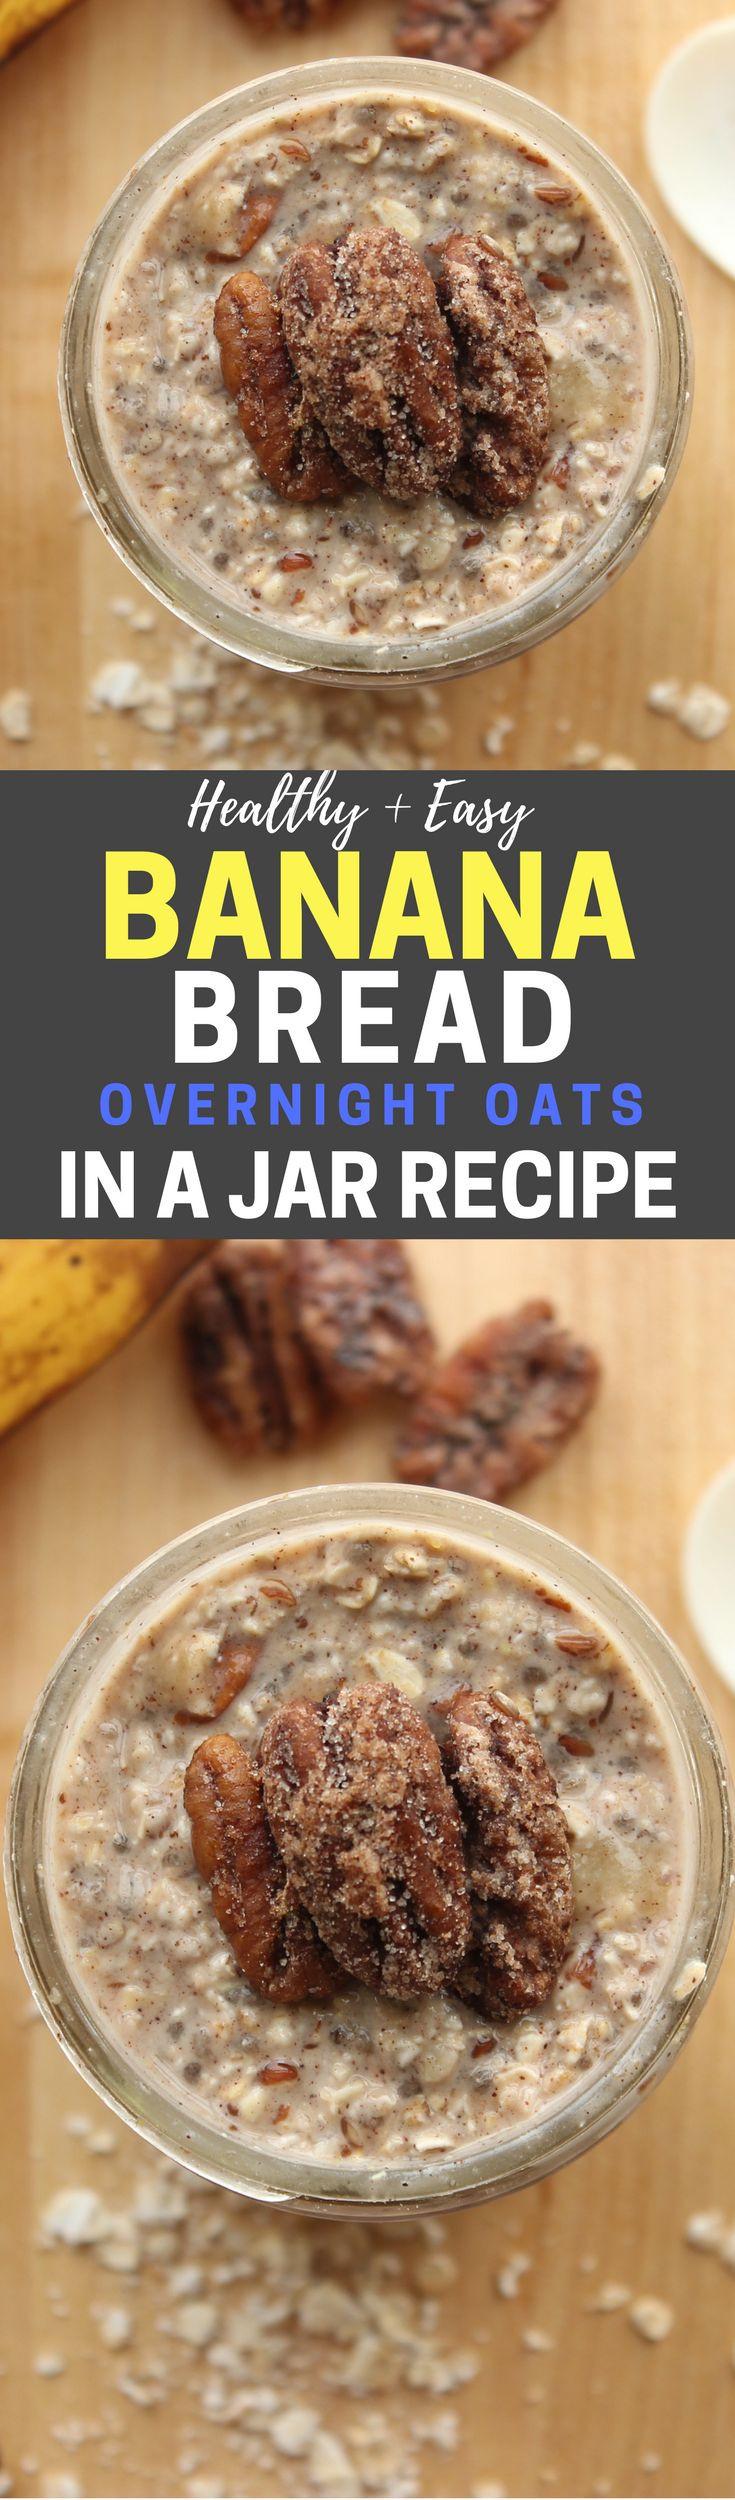 Banana Recipes Healthy Easy  Best 25 Healthy breakfasts ideas on Pinterest